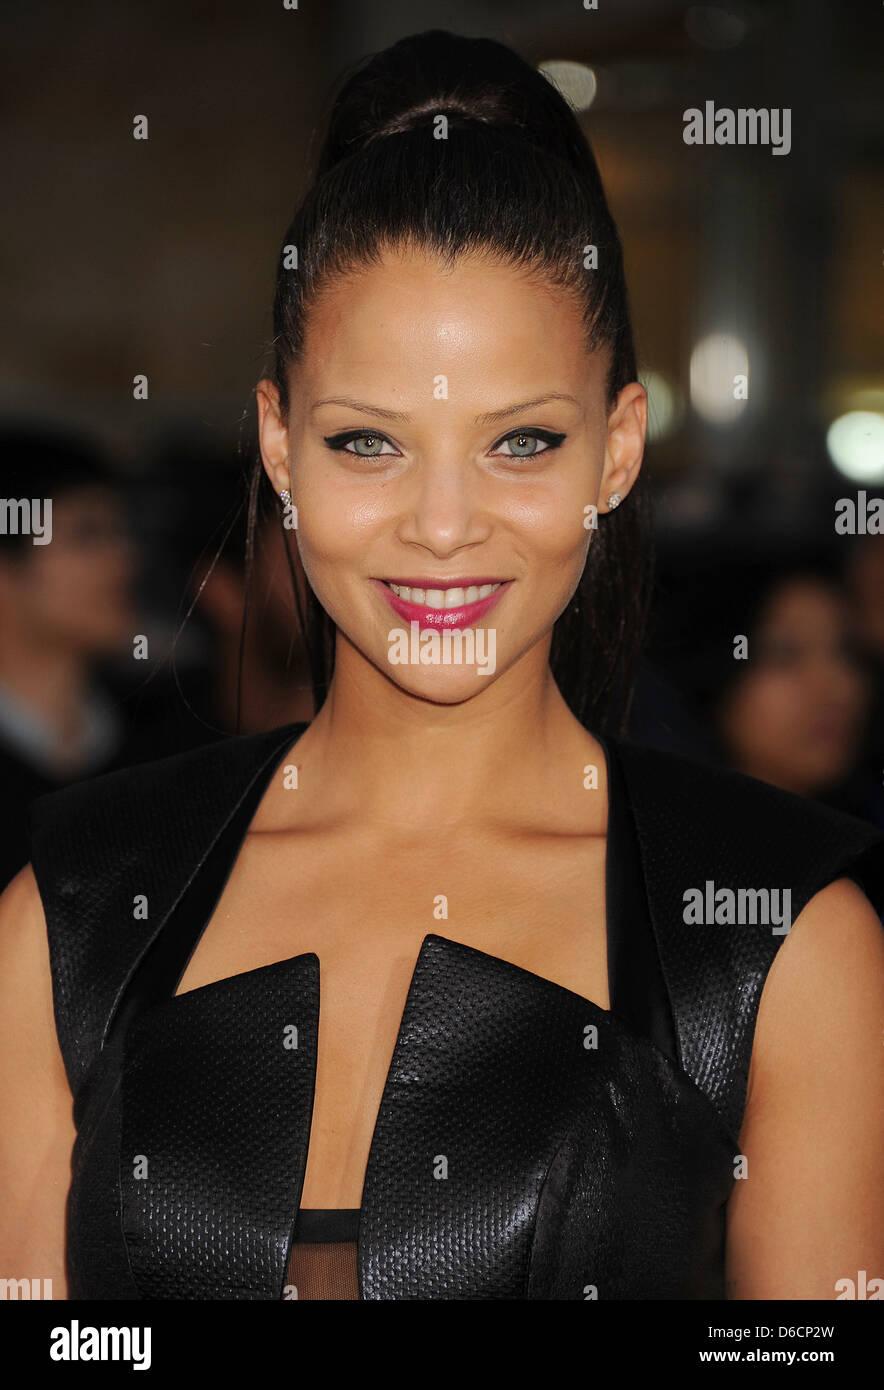 DENISE VASI US attrice cinematografica in aprile 2013. Foto di Jeffrey Mayer Immagini Stock